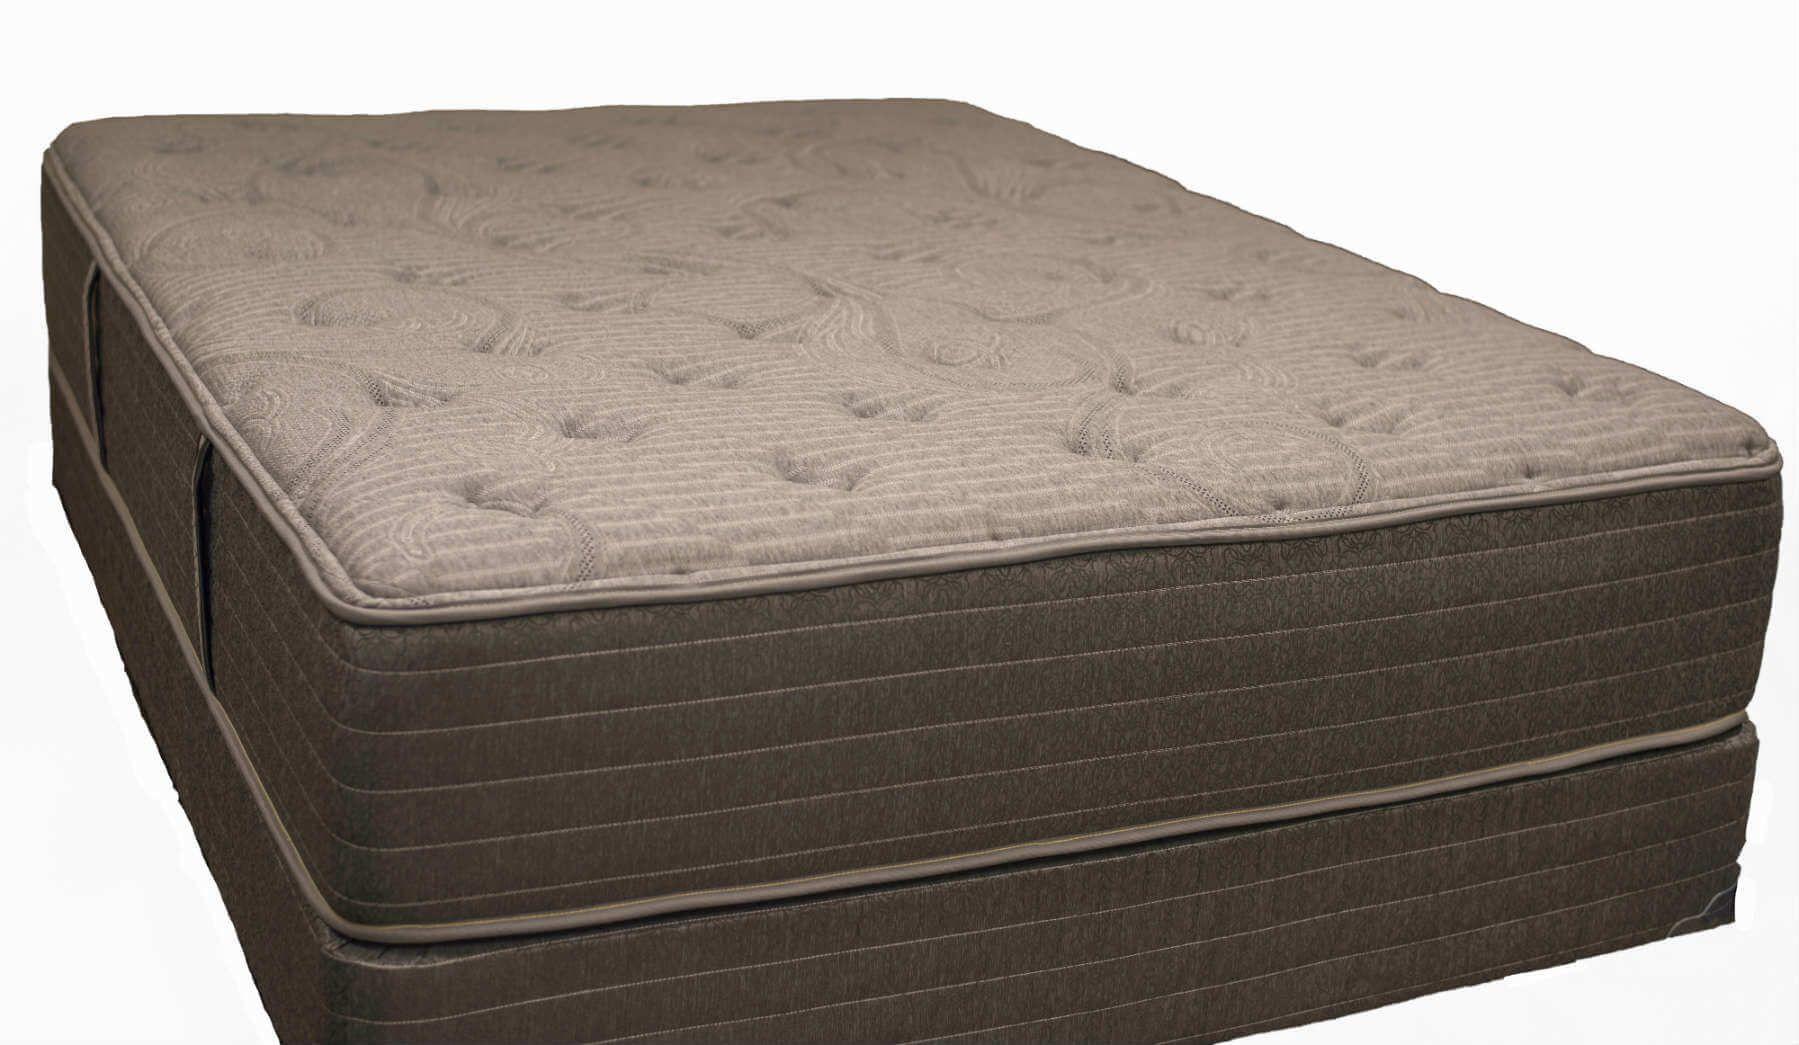 Therapedic Hd Citadel Cushion Firm Mattress The Hd Mattresses Feature The Heaviest Coils The Densest Foams And The Stronges Firm Mattress Mattress Cushions